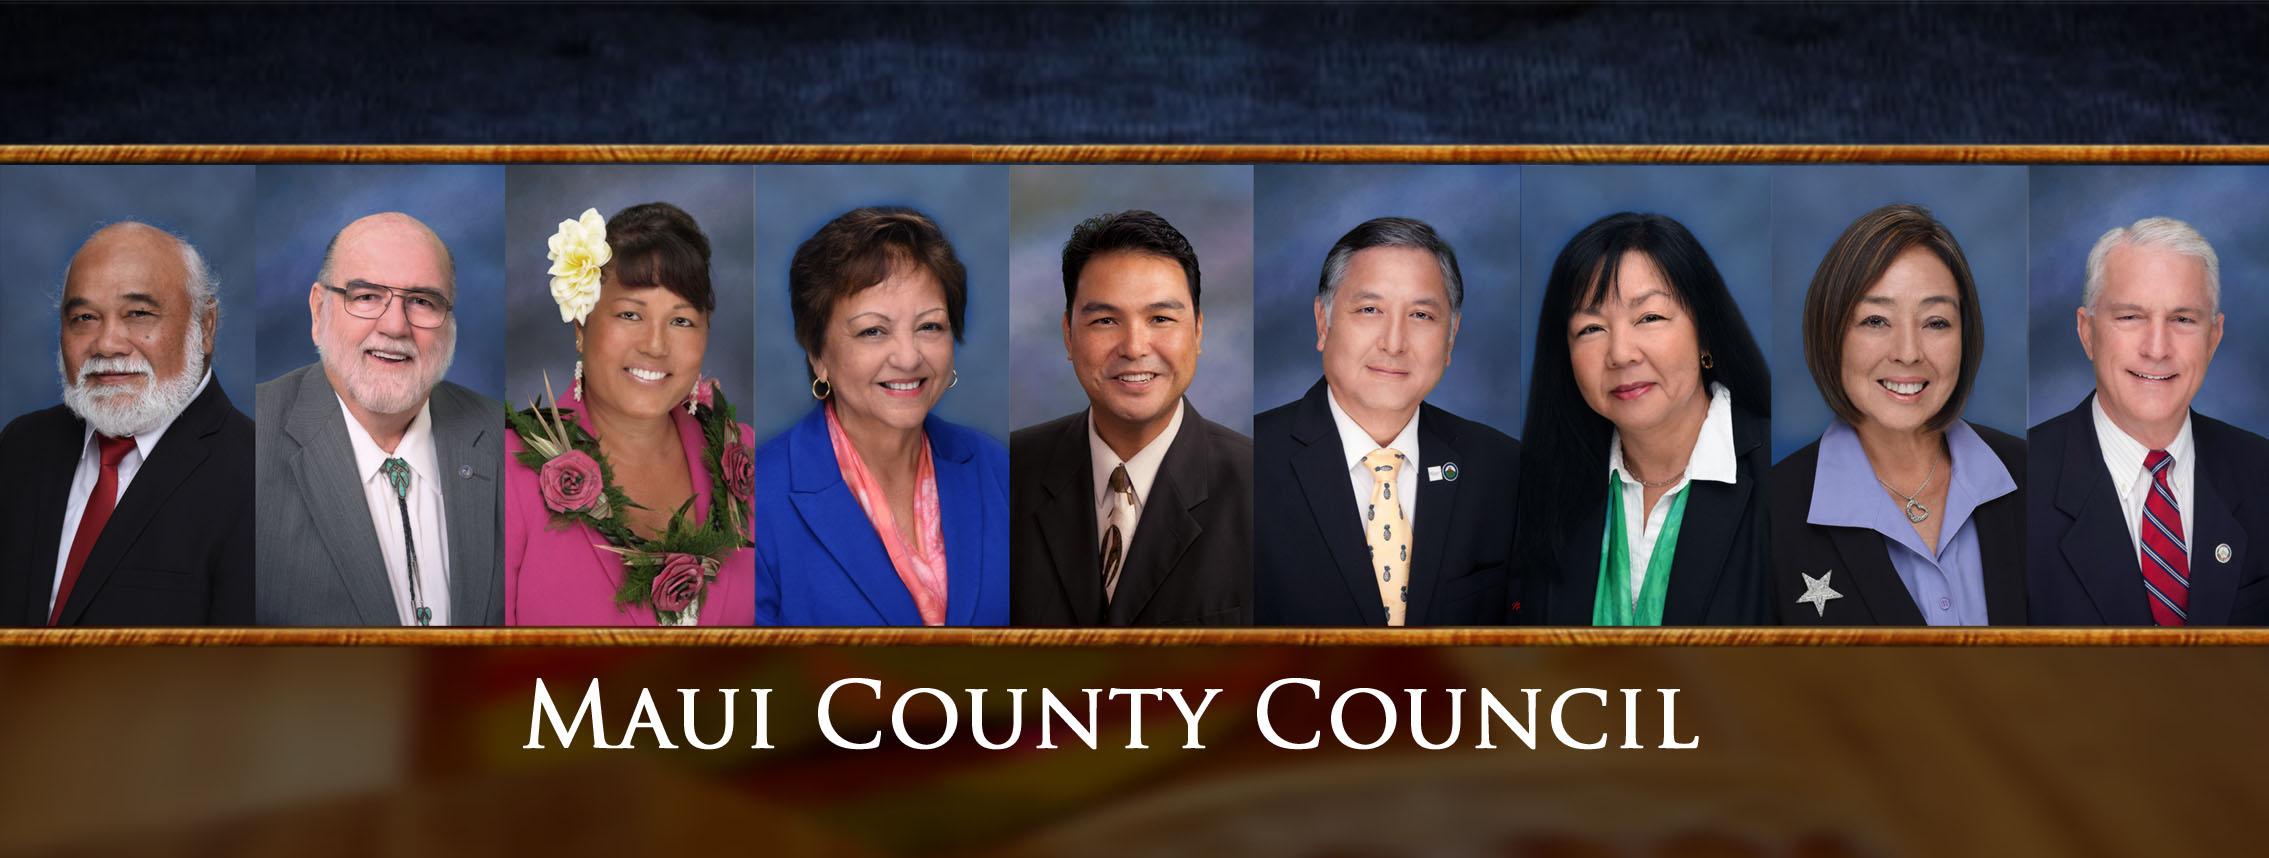 Maui County Council